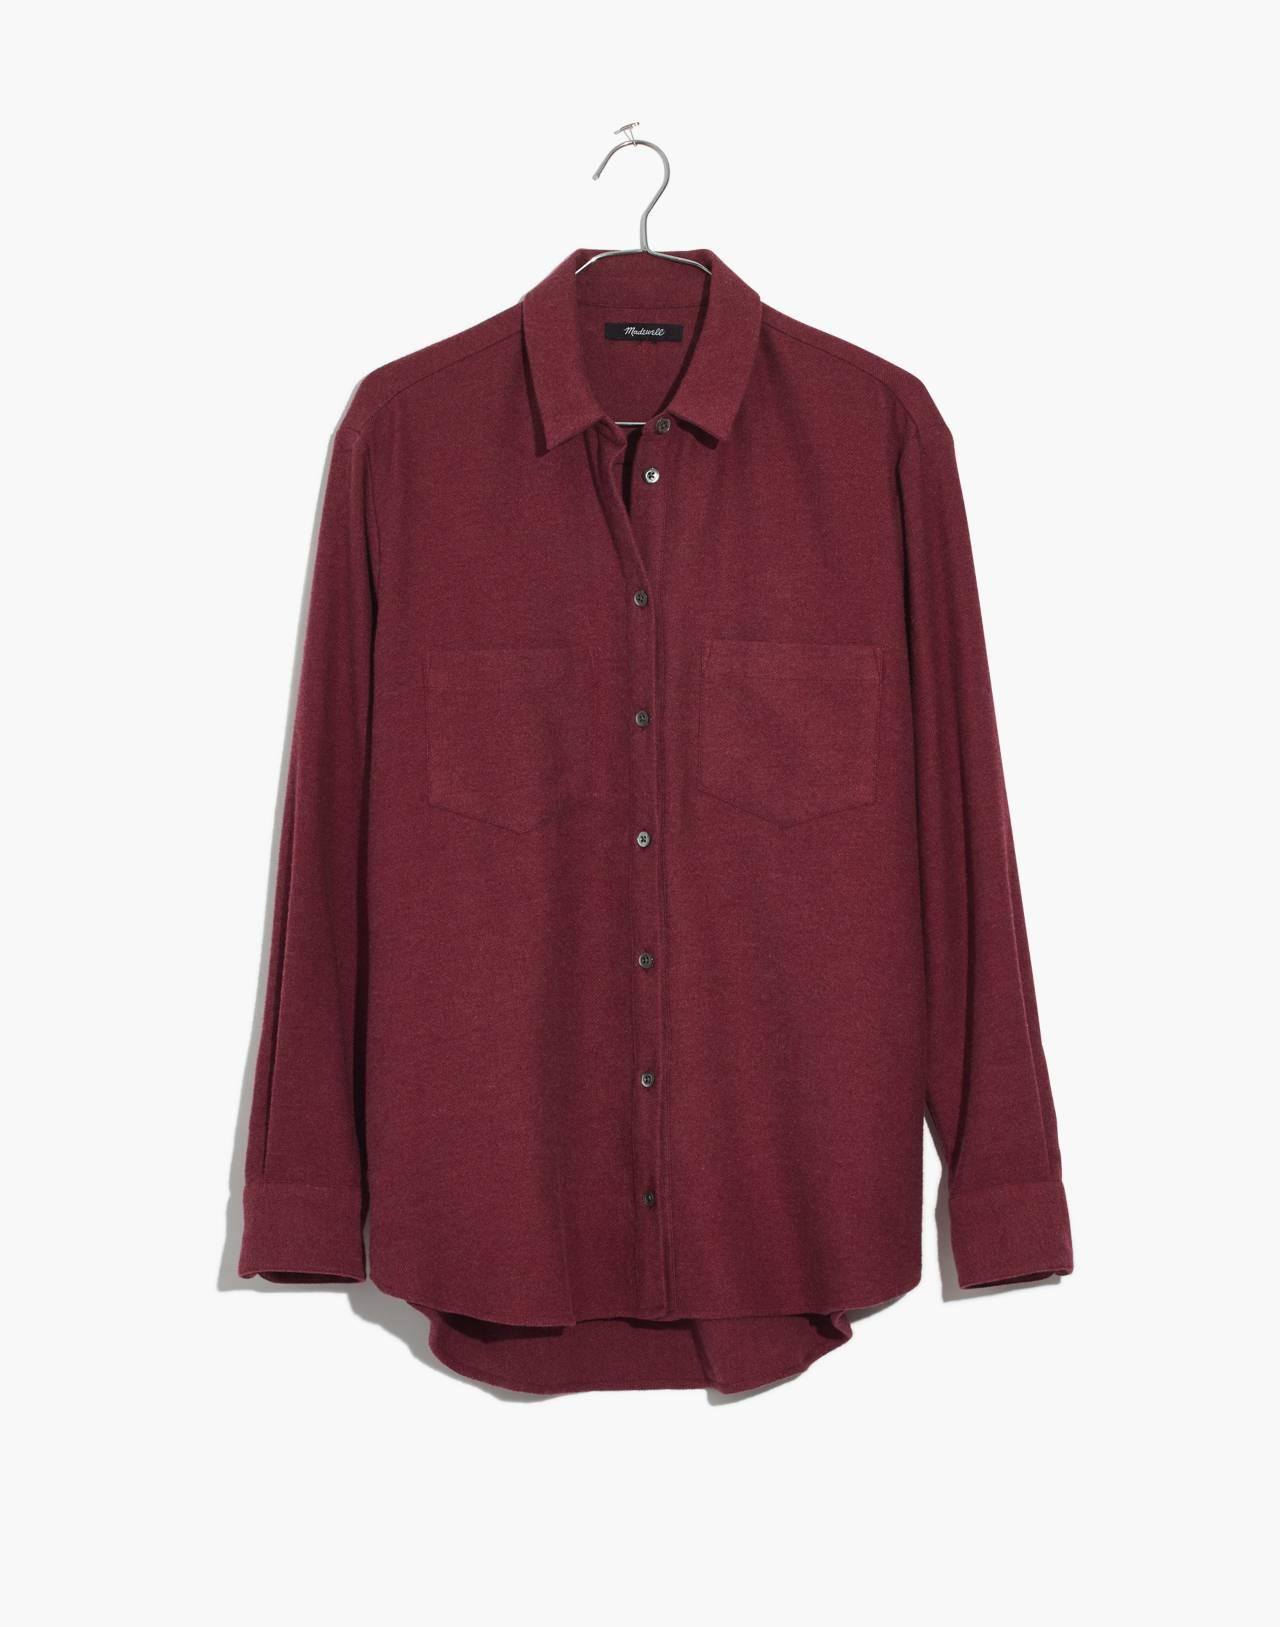 Flannel Sunday Shirt in light burgundy image 4